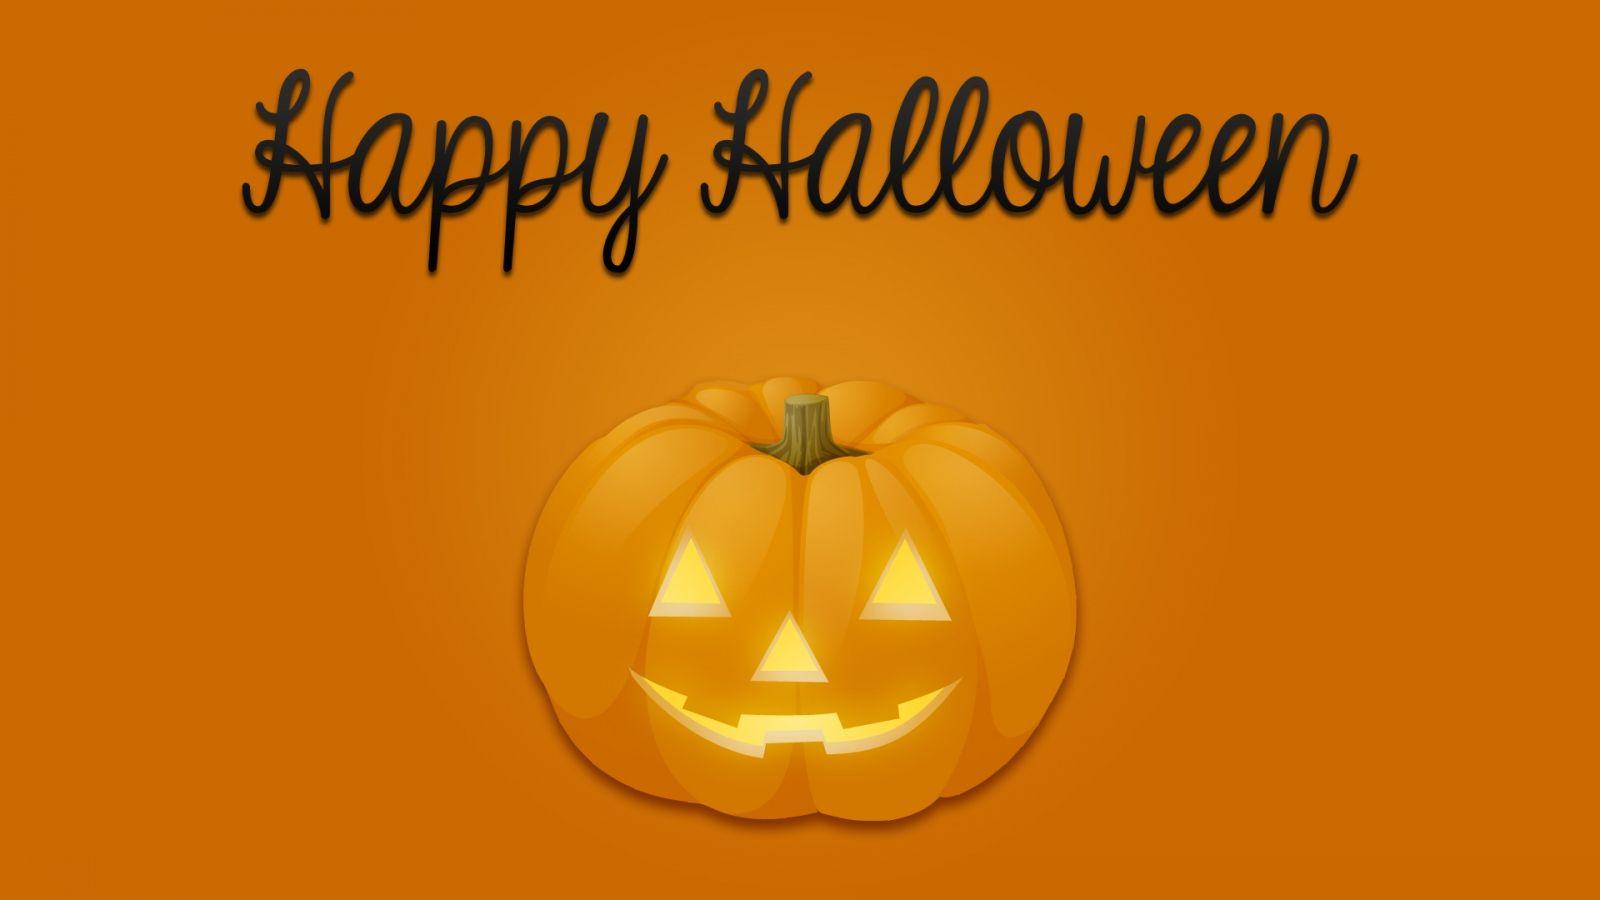 Cute Halloween Wallpaper 15758 Halloween Desktop Wallpaper Cute Halloween Pictures Halloween Pumpkin Images